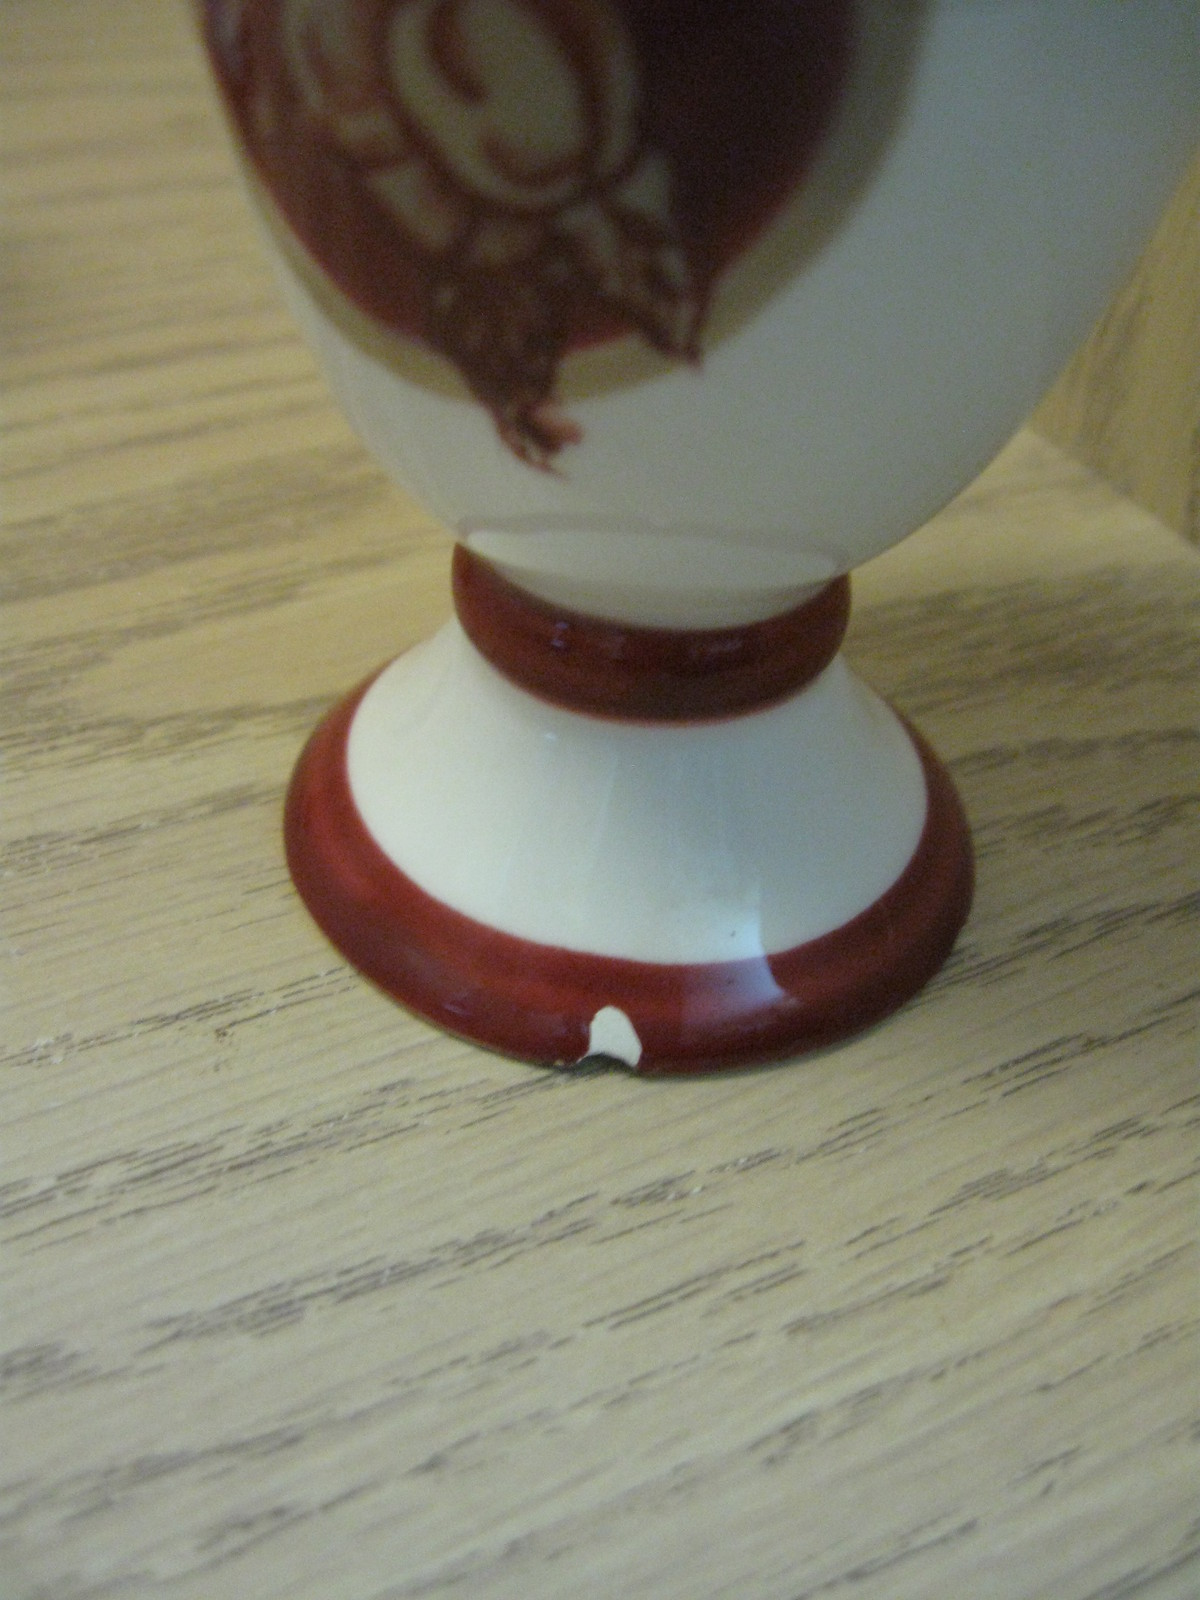 Home China Sugar & Creamer, Salt & Pepper Shaker Set Terracotta Home Co